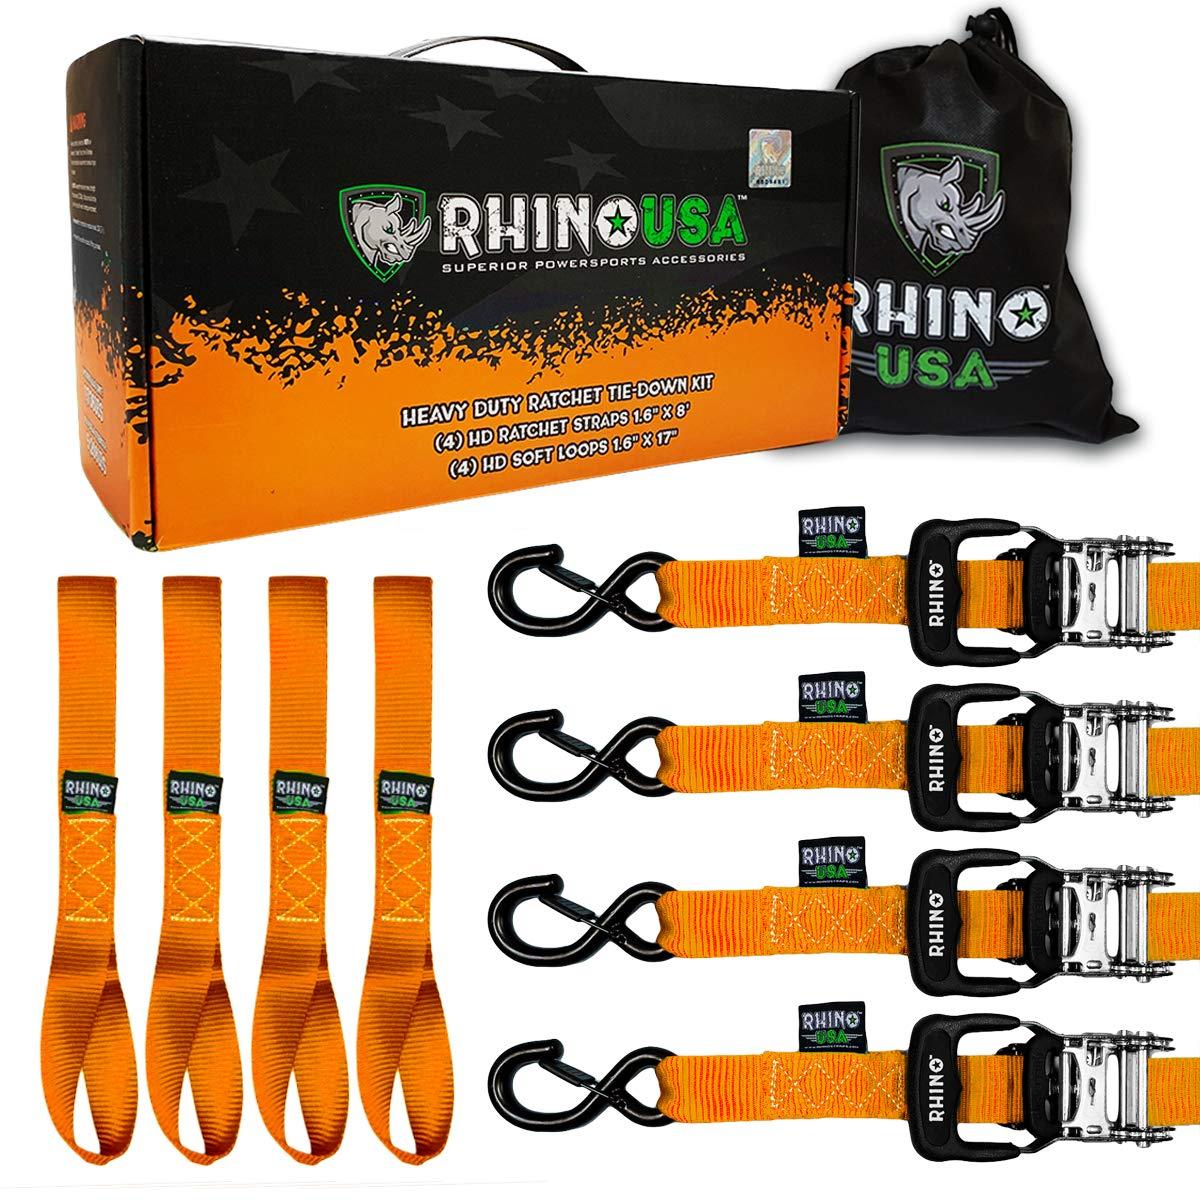 RHINO USA Ratchet Straps Heavy Duty Tie Down Set, 5,208 Break Strength - (4) Heavy Duty 1.6'' x 8' Cargo Tiedowns with Padded Handles & Coated Chromoly S Hooks + (4) Soft Loop Tie Downs Strap (ORANGE) by Rhino USA